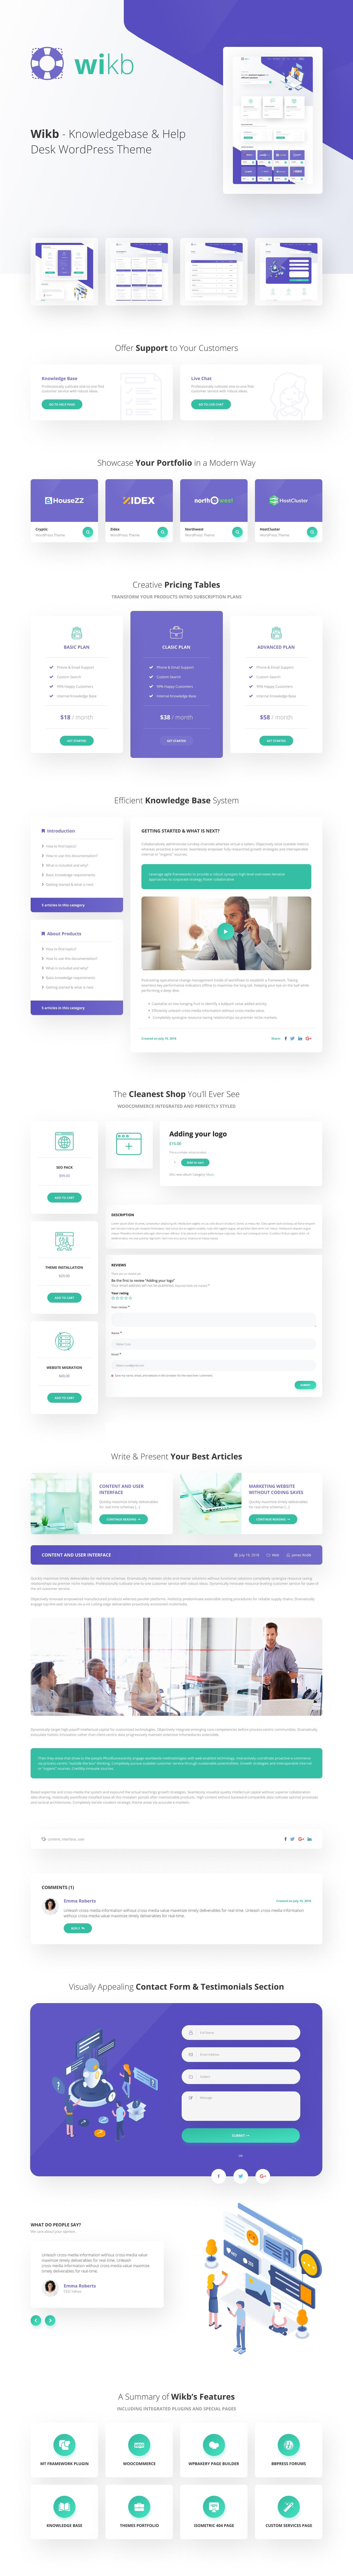 Wikb - Knowledgebase & Help Desk WP Theme - 2